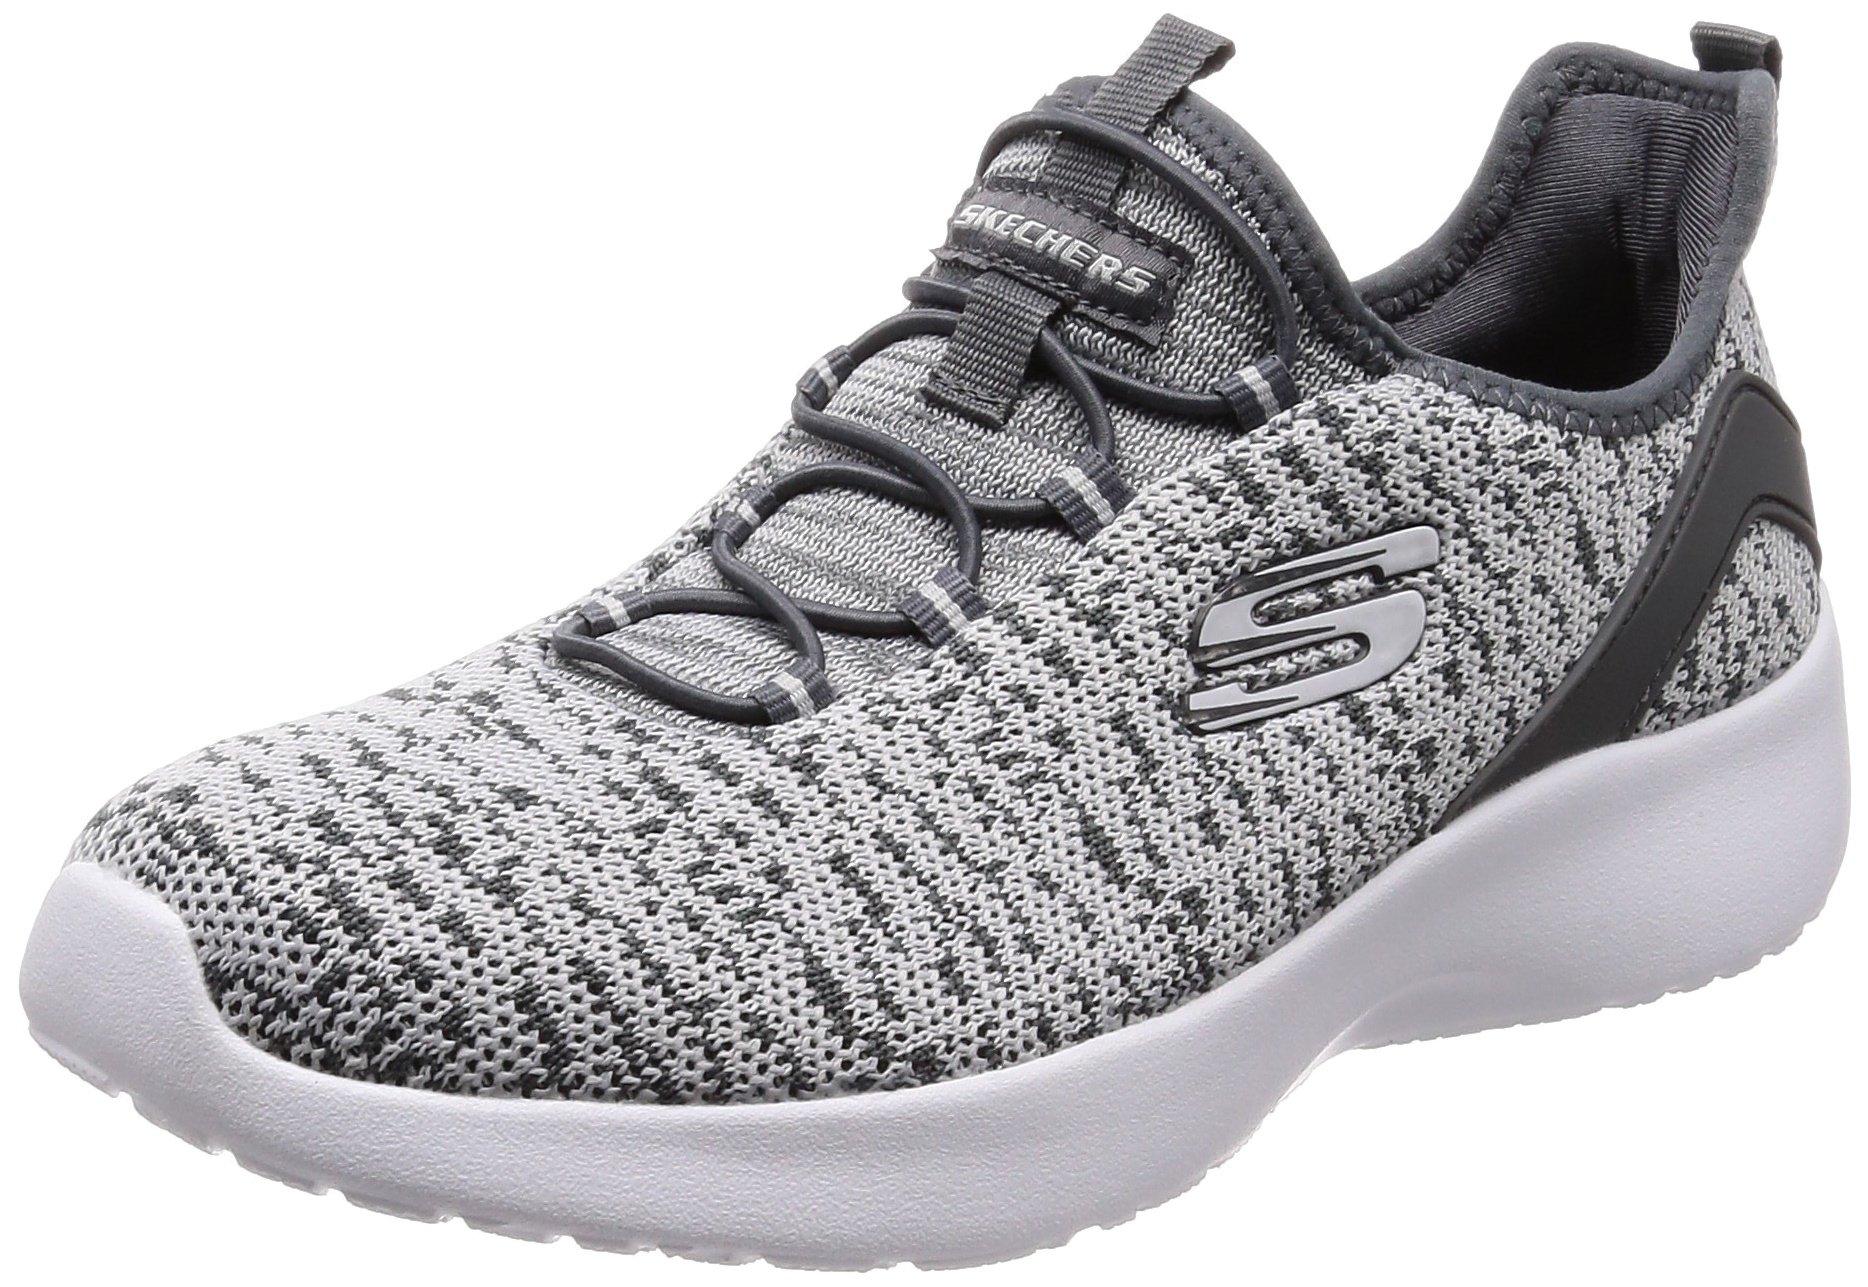 Skechers Women's Dynamight Fleetly Gray Ankle-High Running Shoe - 7M